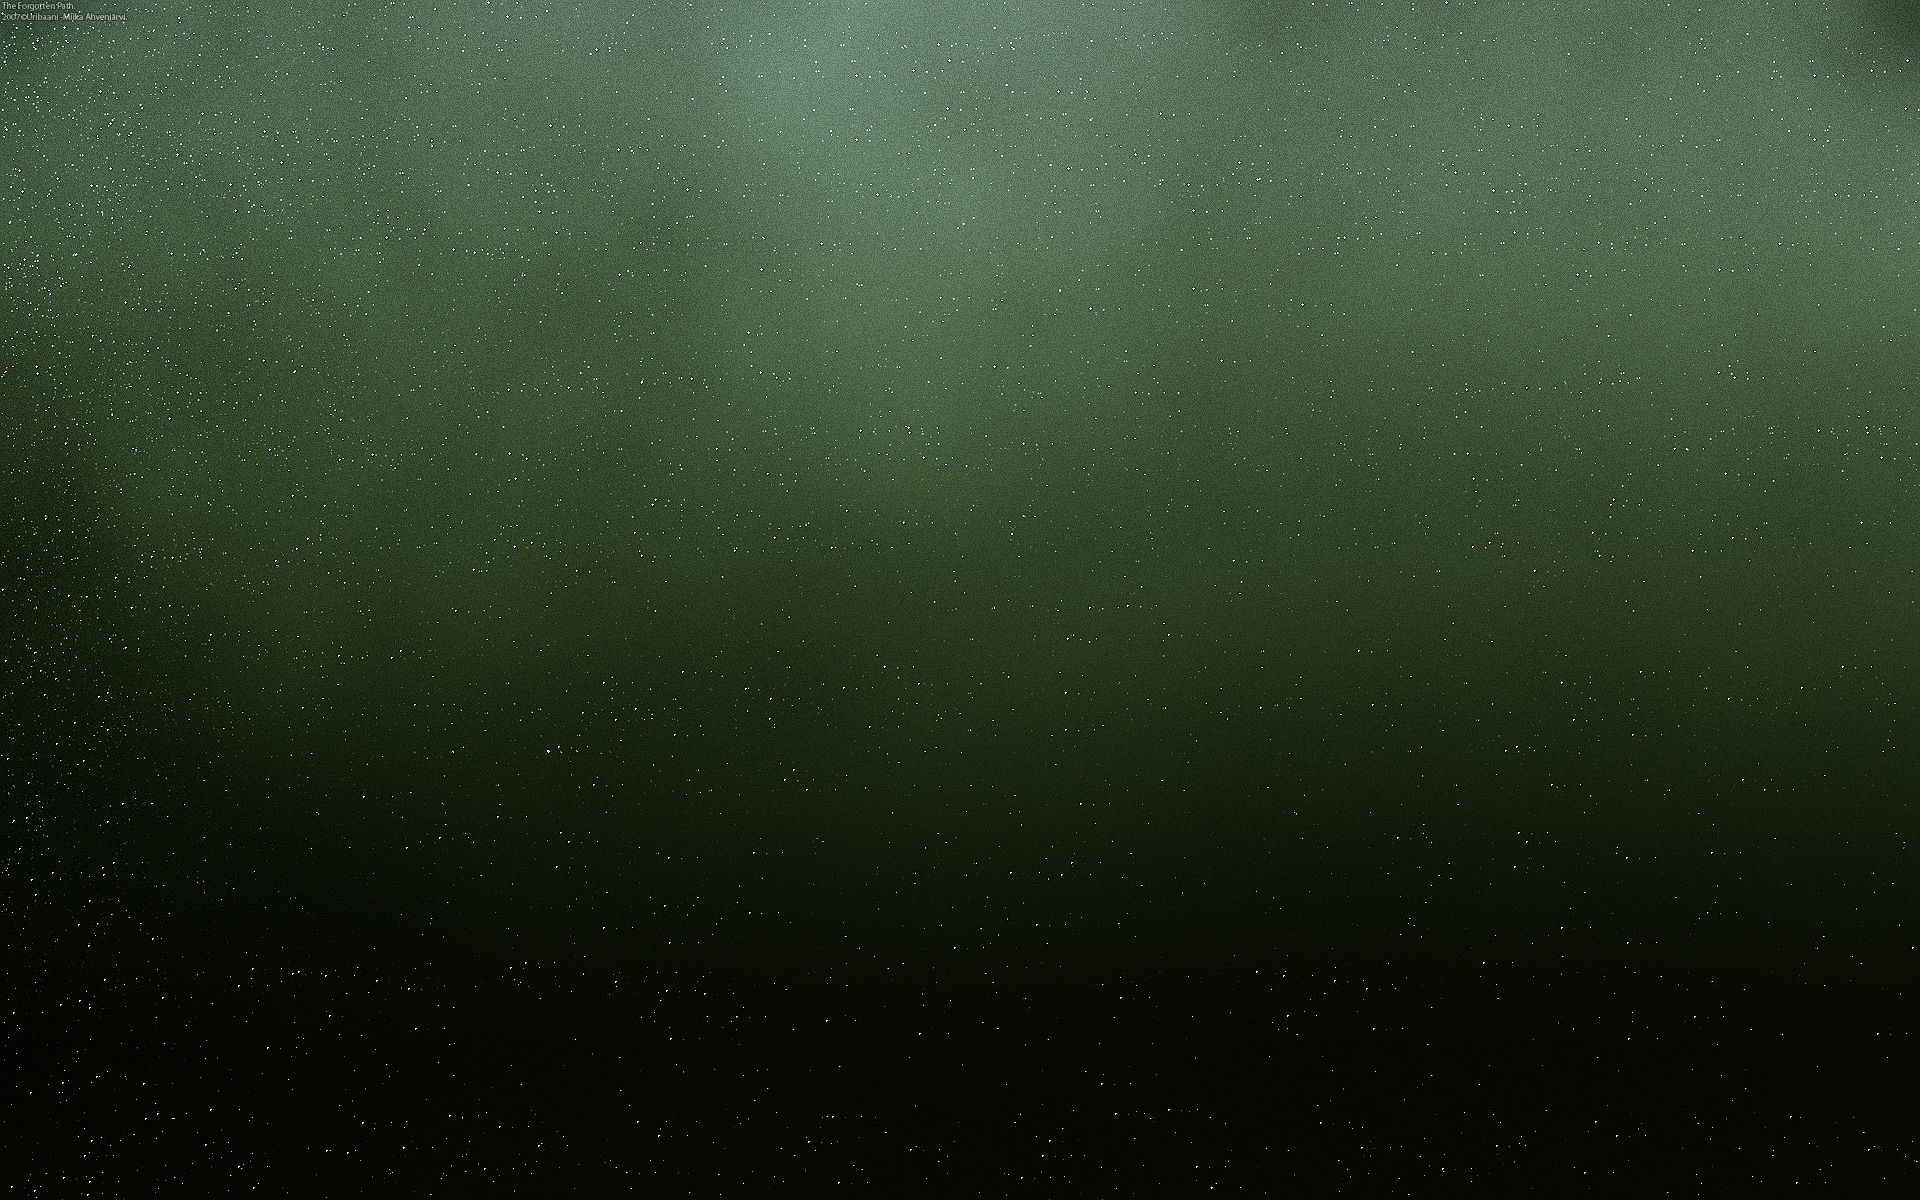 42 Olive Green Desktop Wallpaper On Wallpapersafari